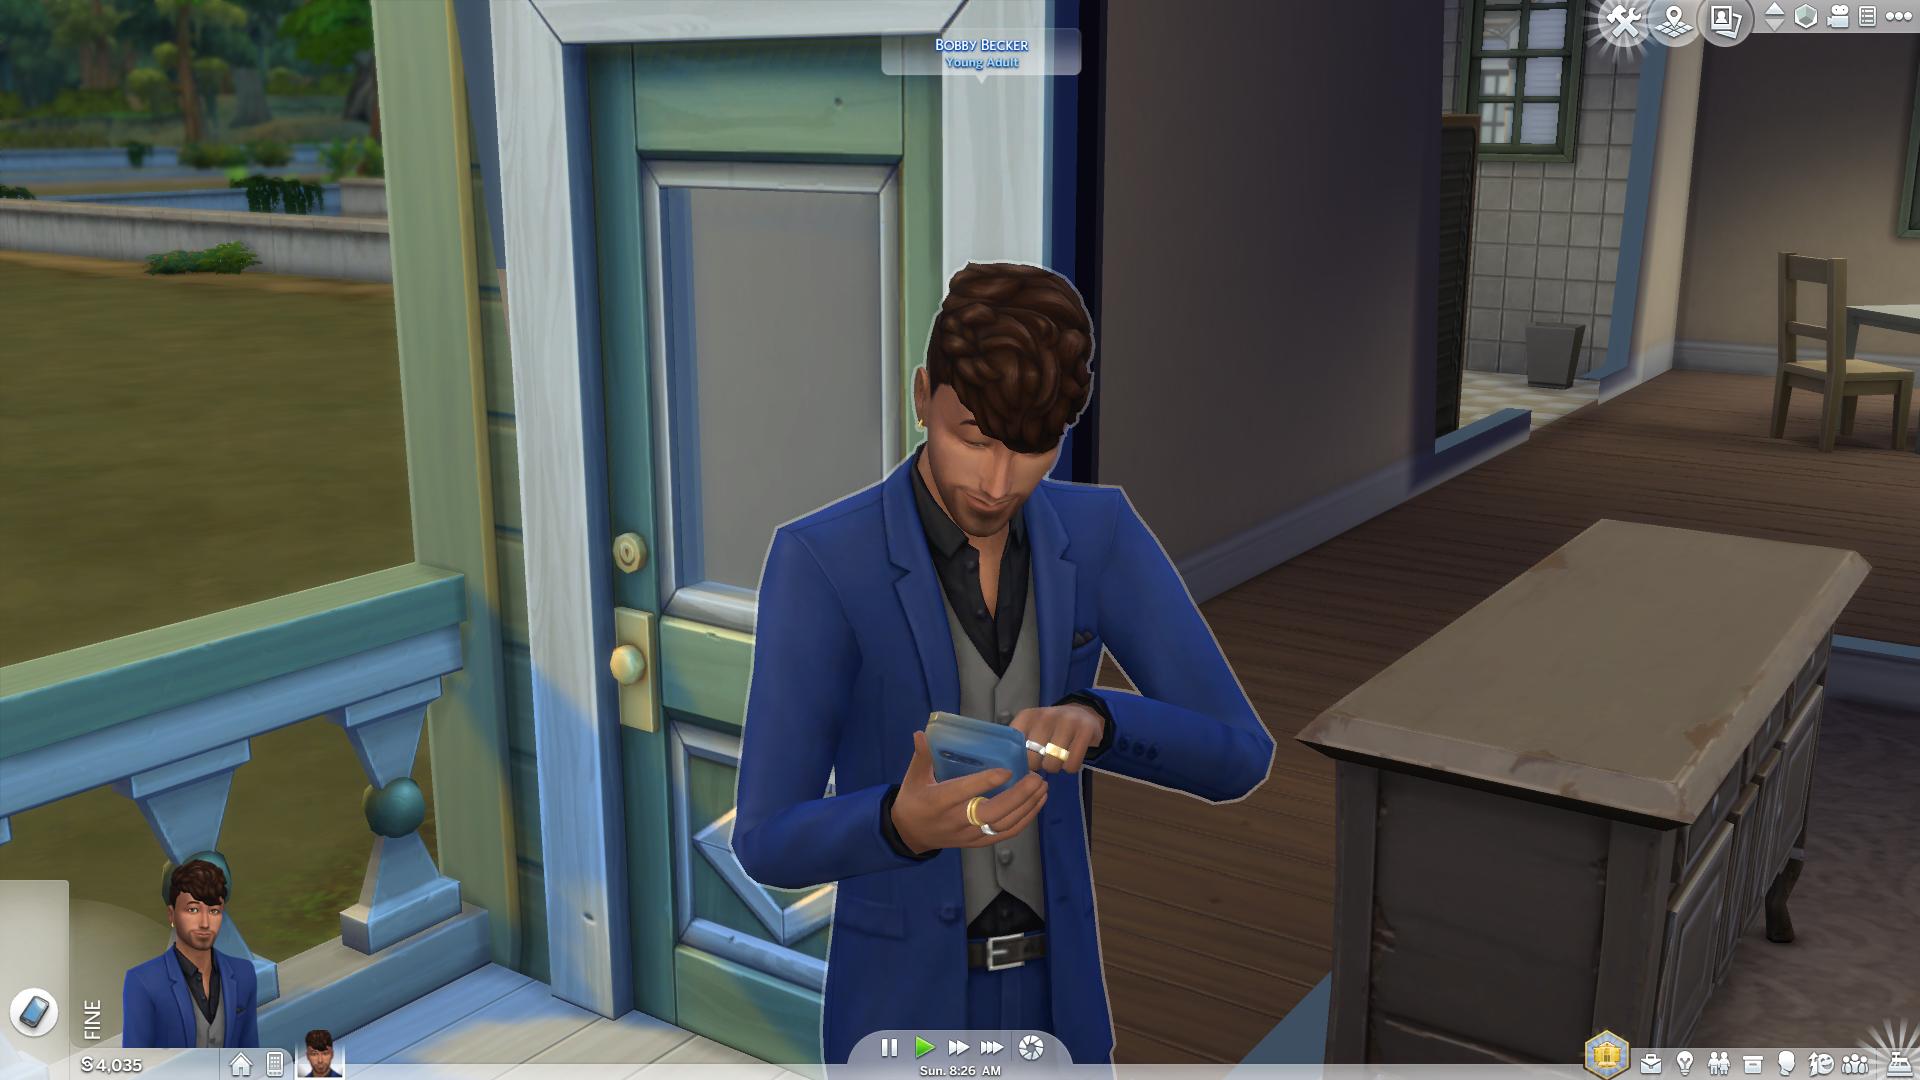 The Sims 4 - Lutris